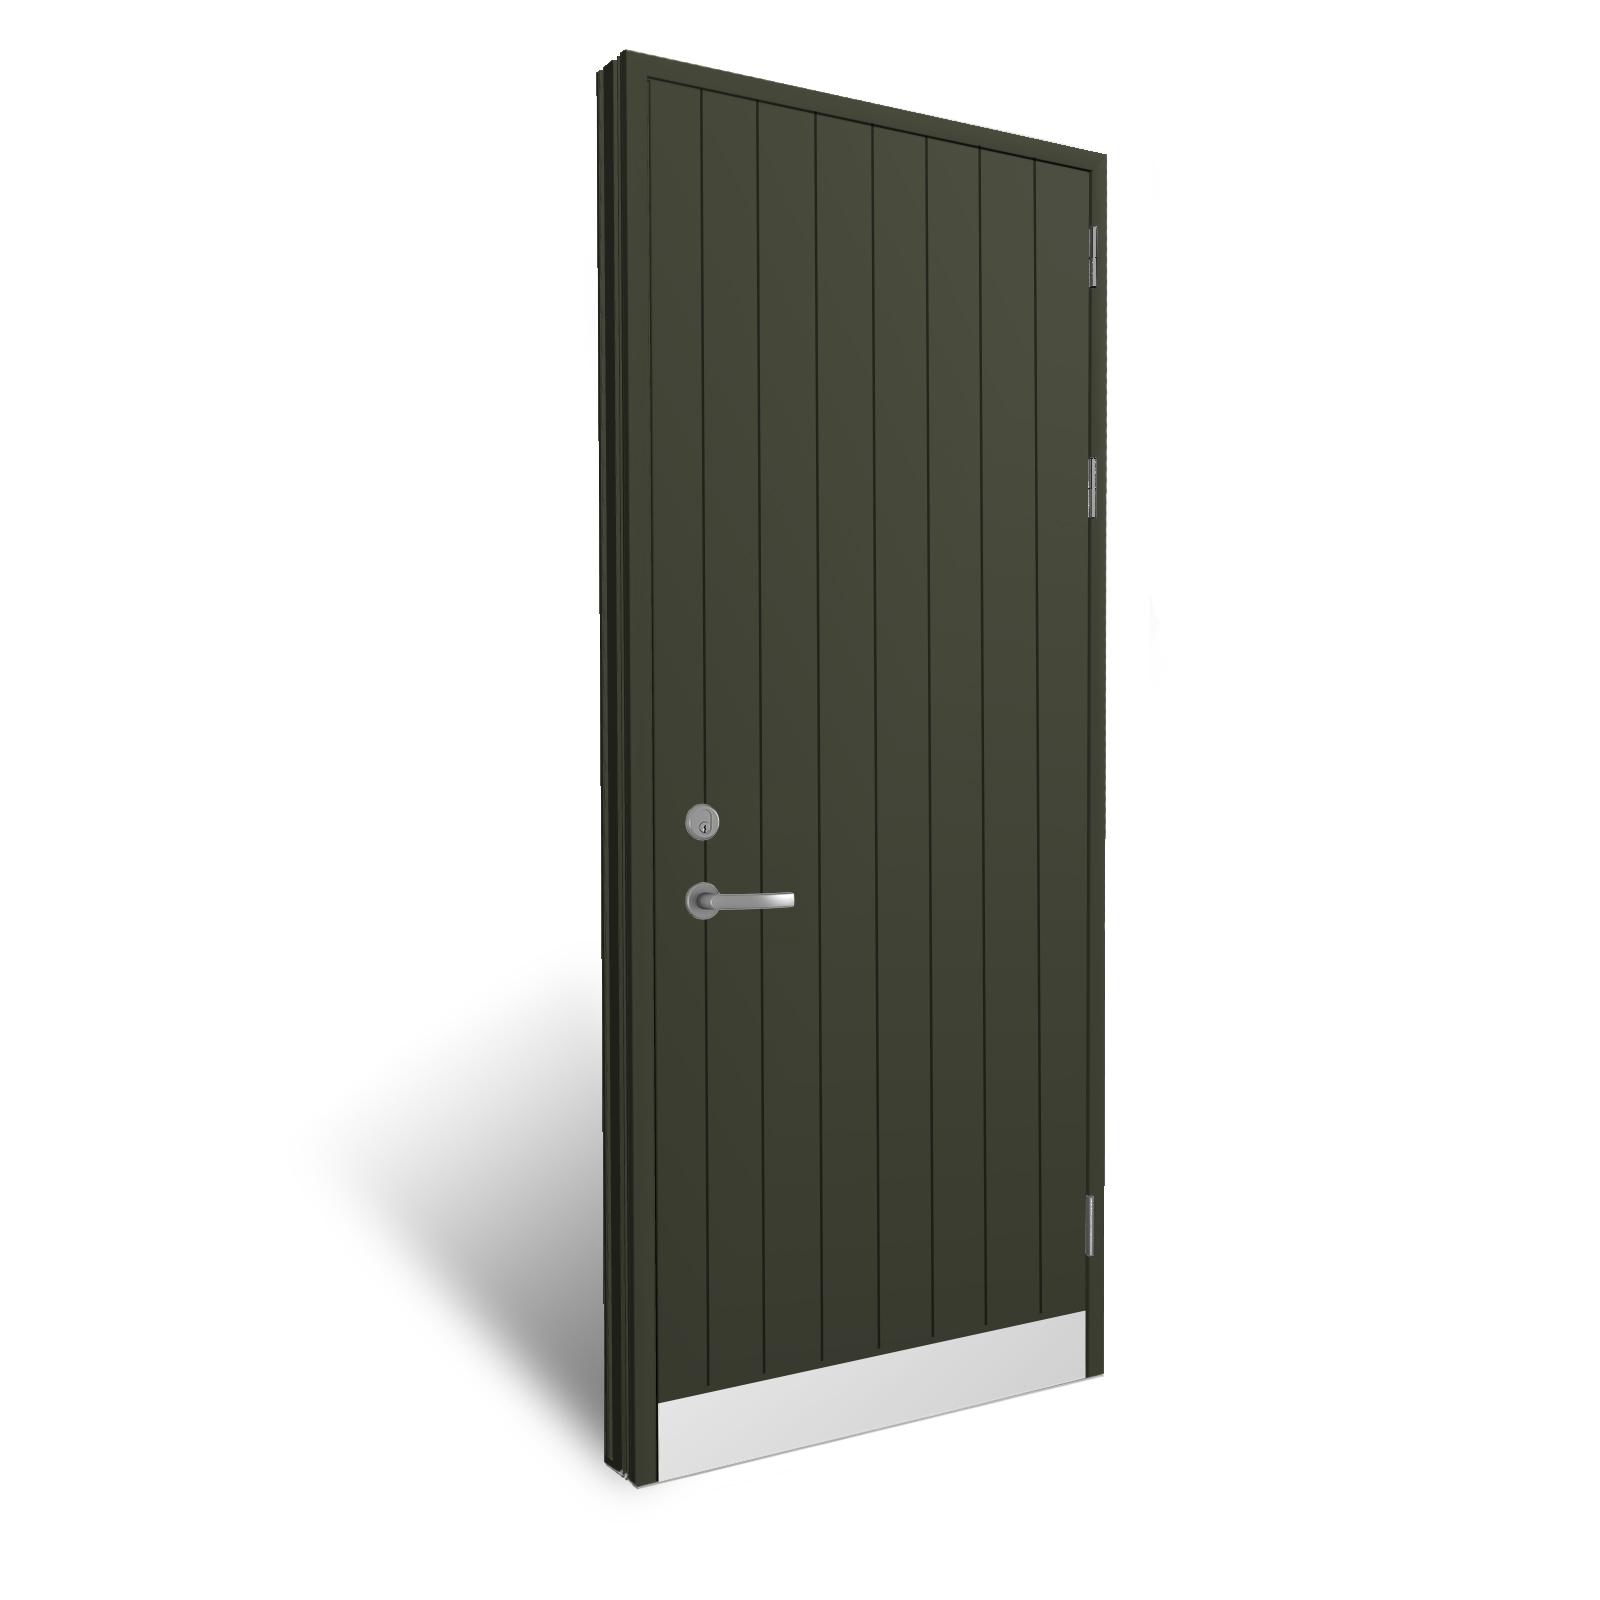 Idealcombi Flush Panel Door Black Vertical Grooves